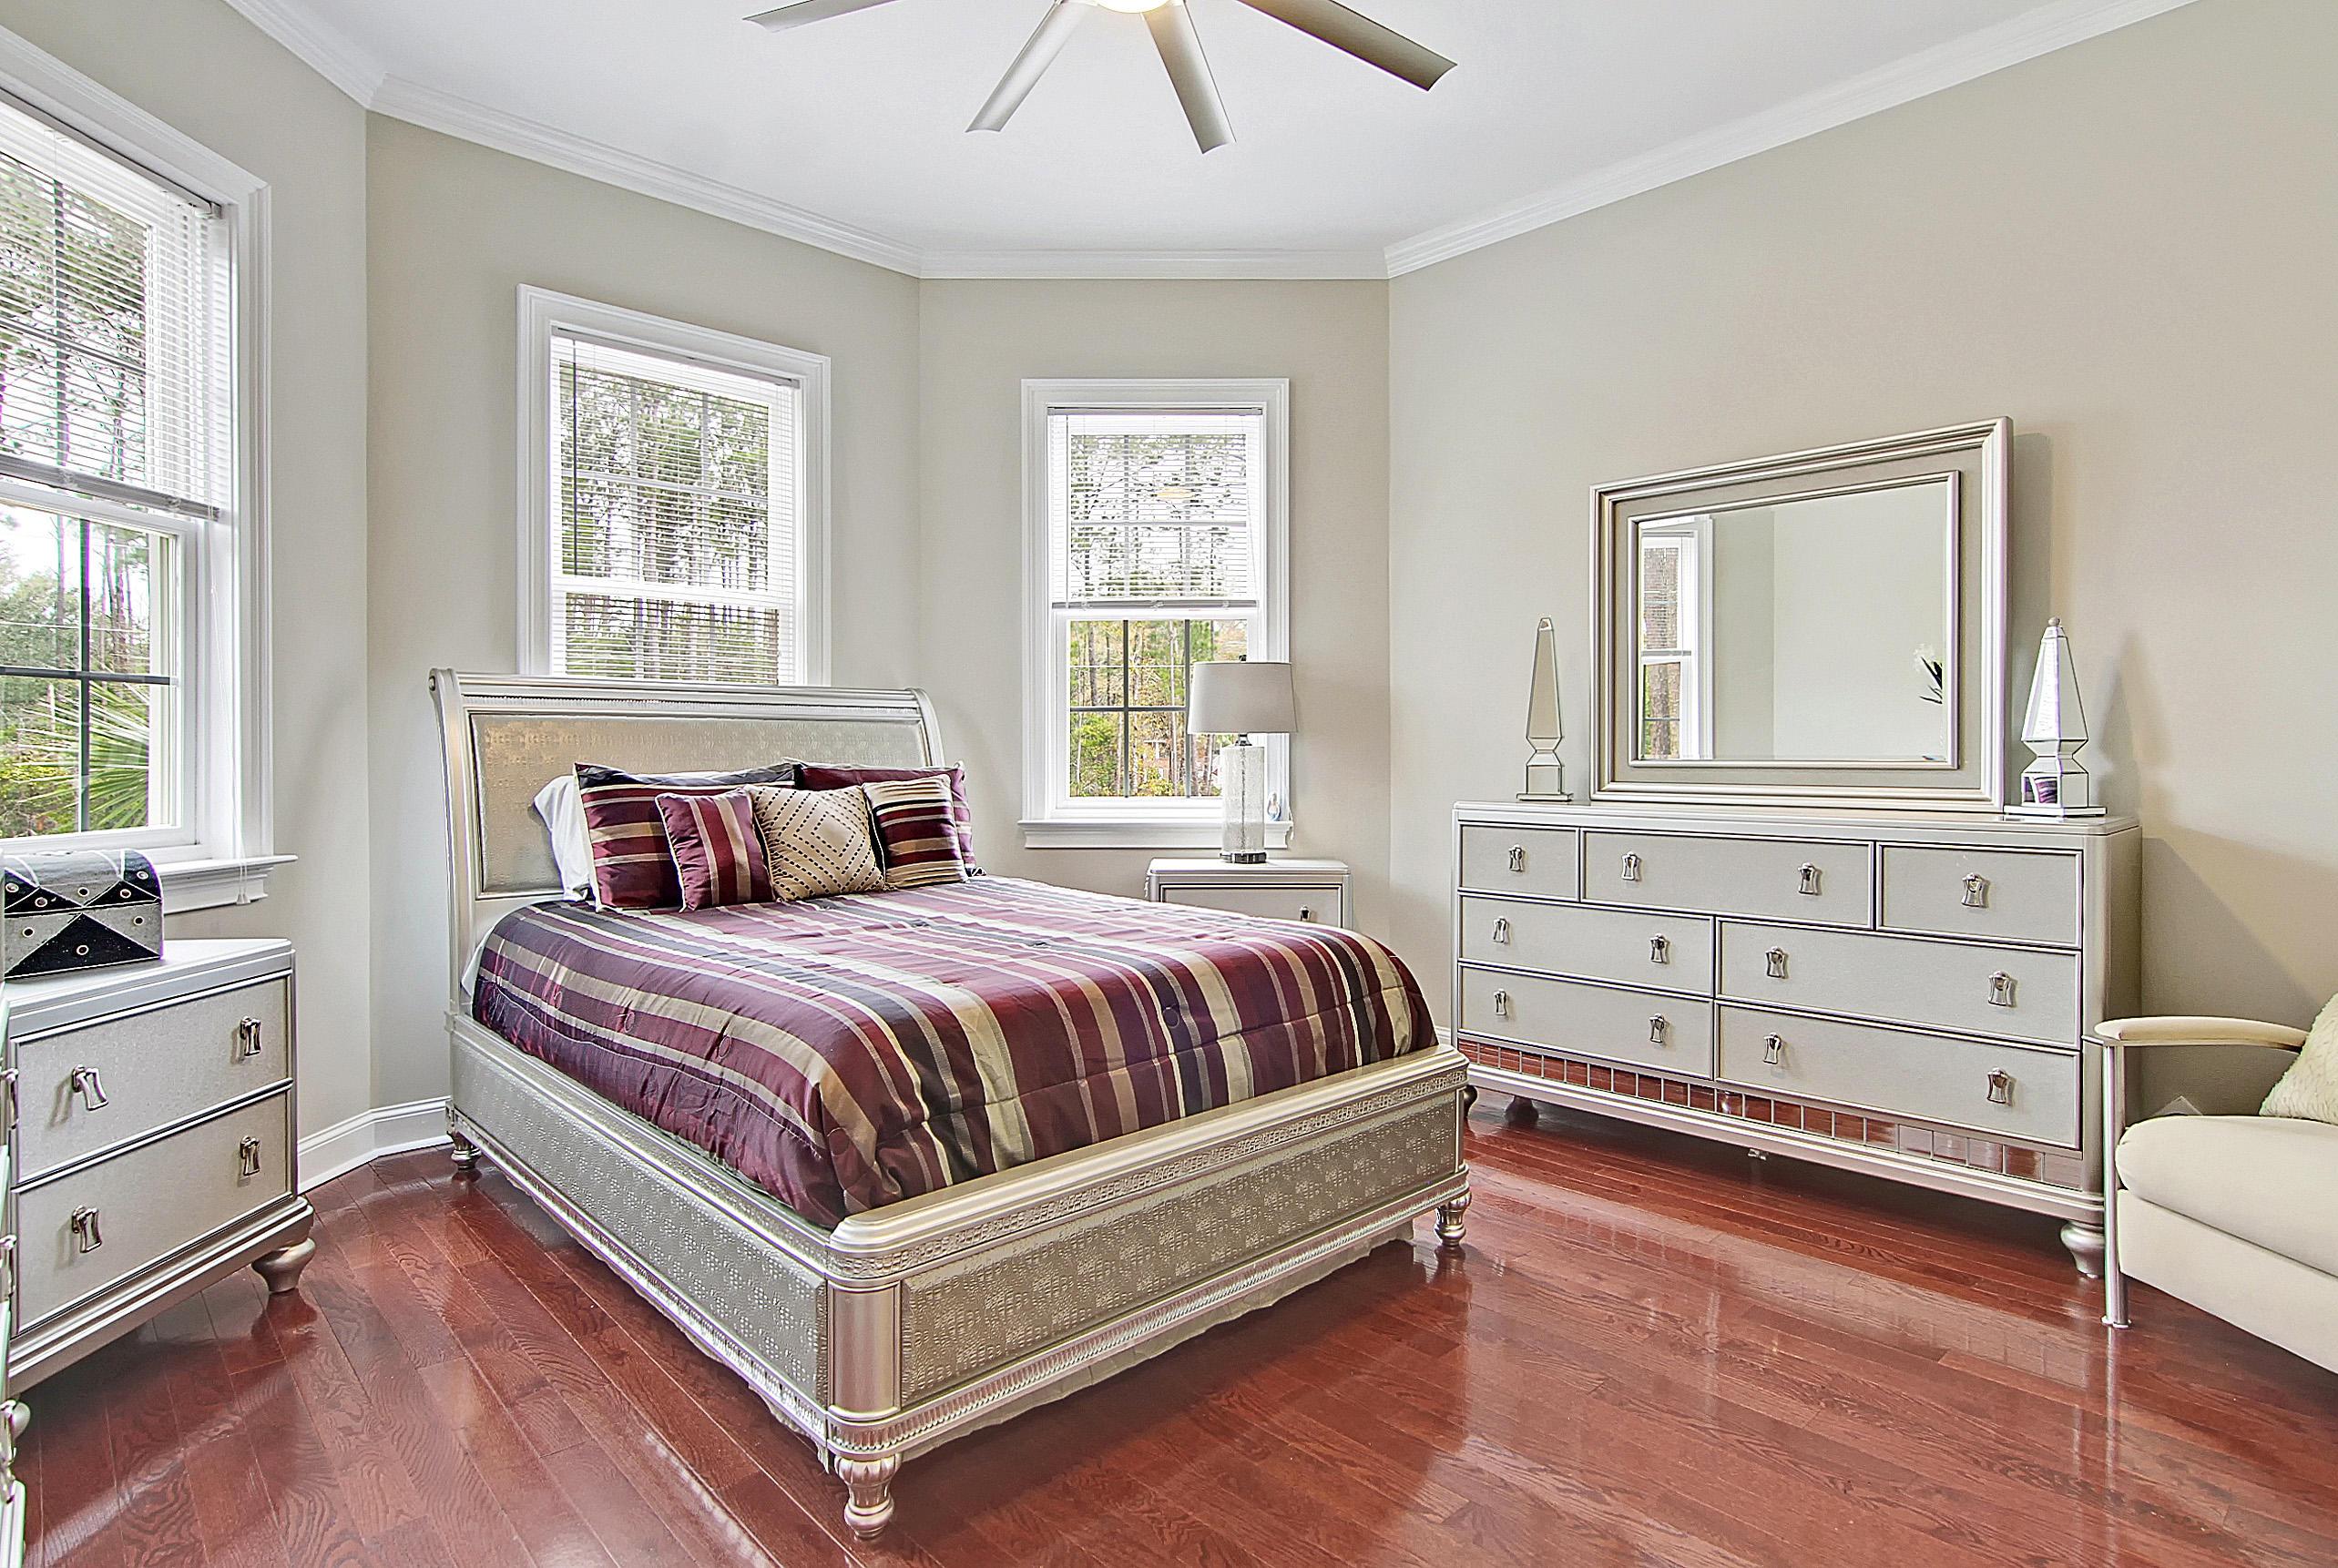 Hamlin Beach Homes For Sale - 2797 Hamlin Beach, Mount Pleasant, SC - 54